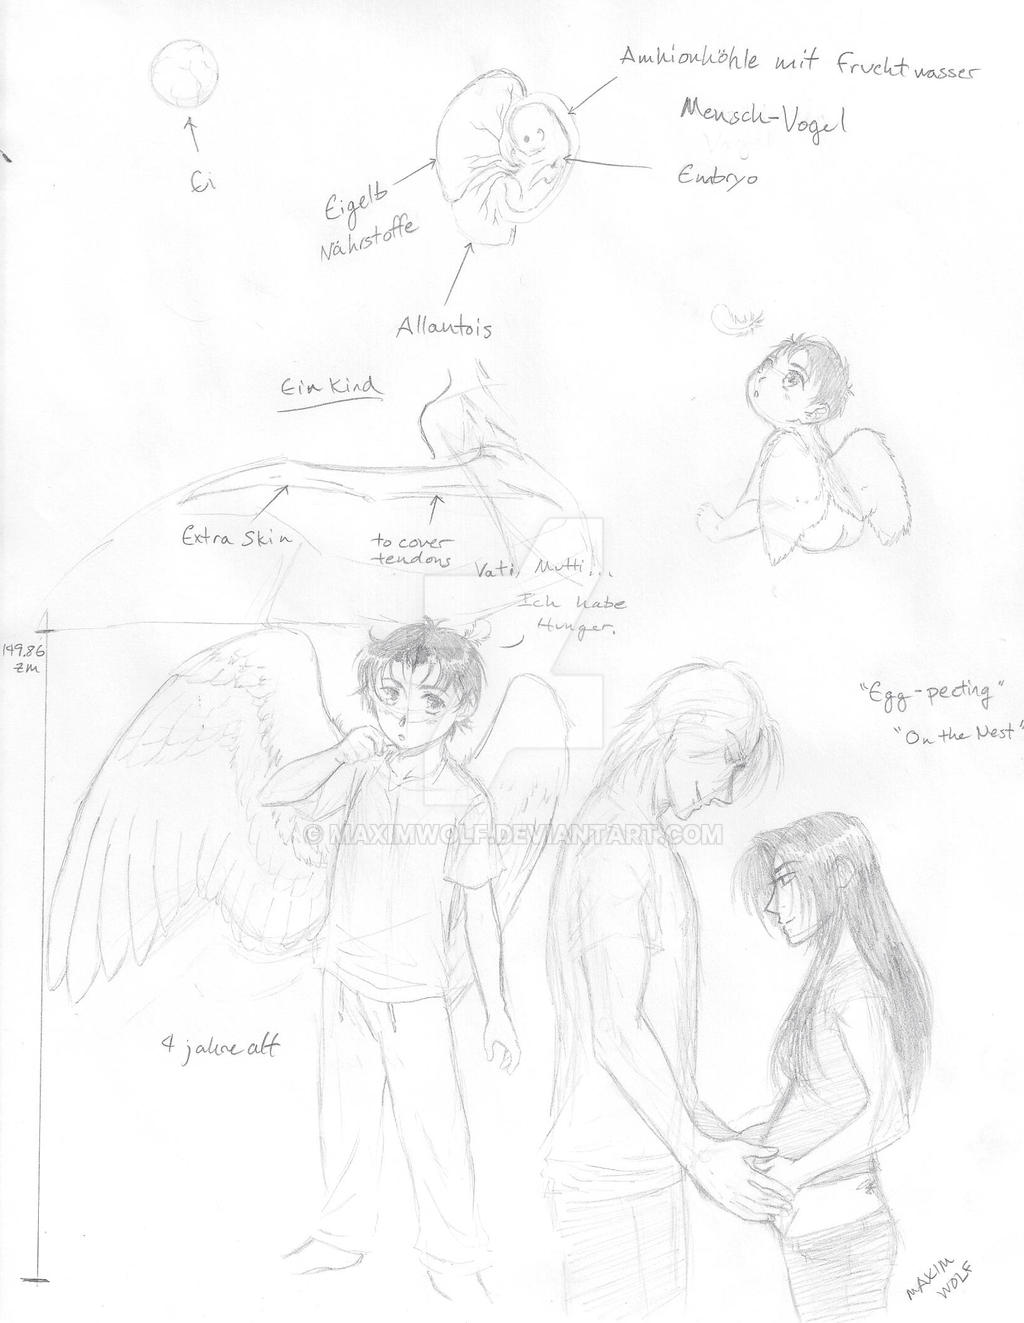 Human-Avian Anatomy: Egg-Chick-Child by MaximWolf on DeviantArt